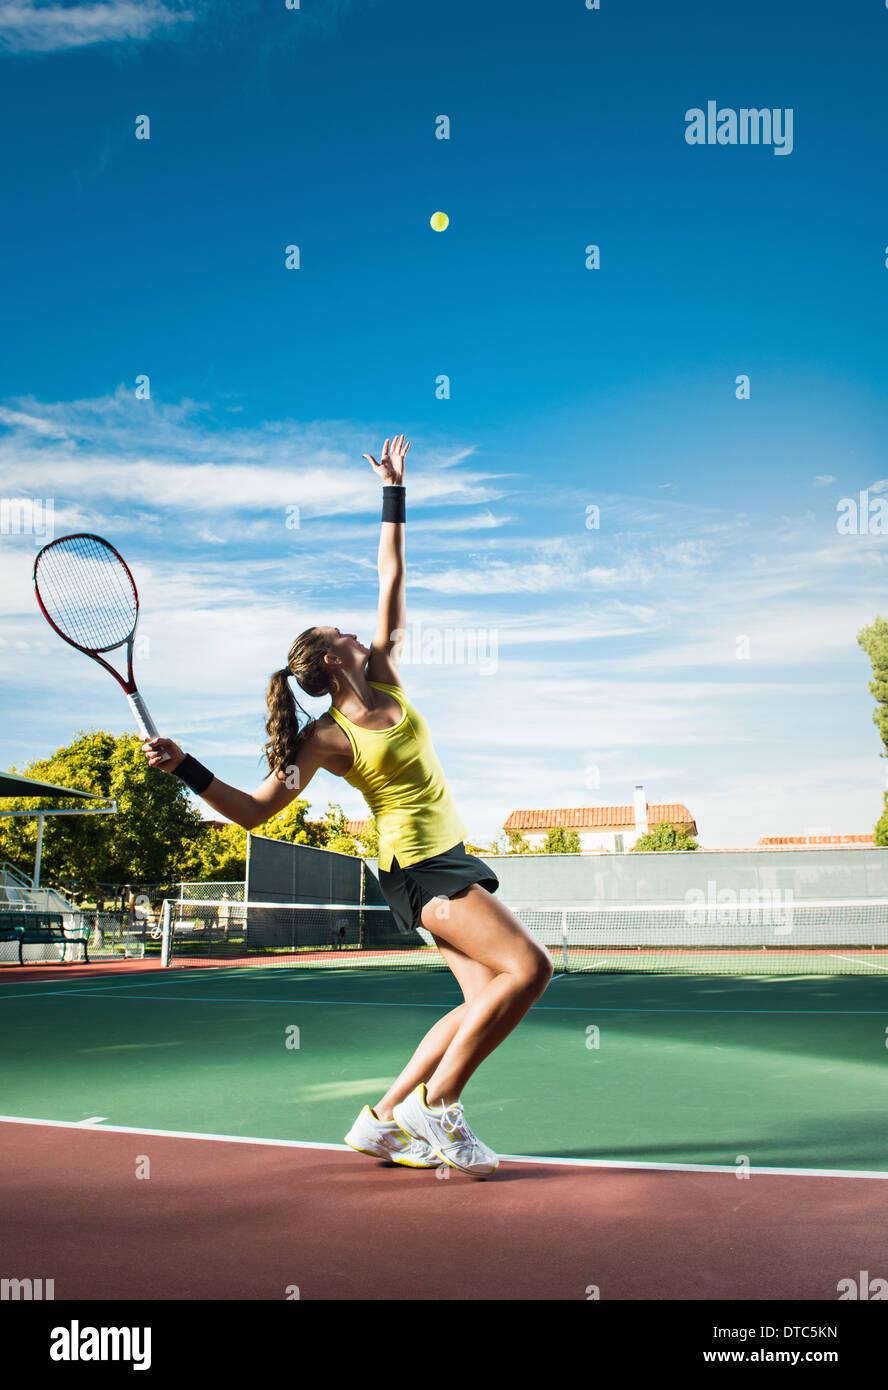 Female tennis player hitting ball - Stock Image